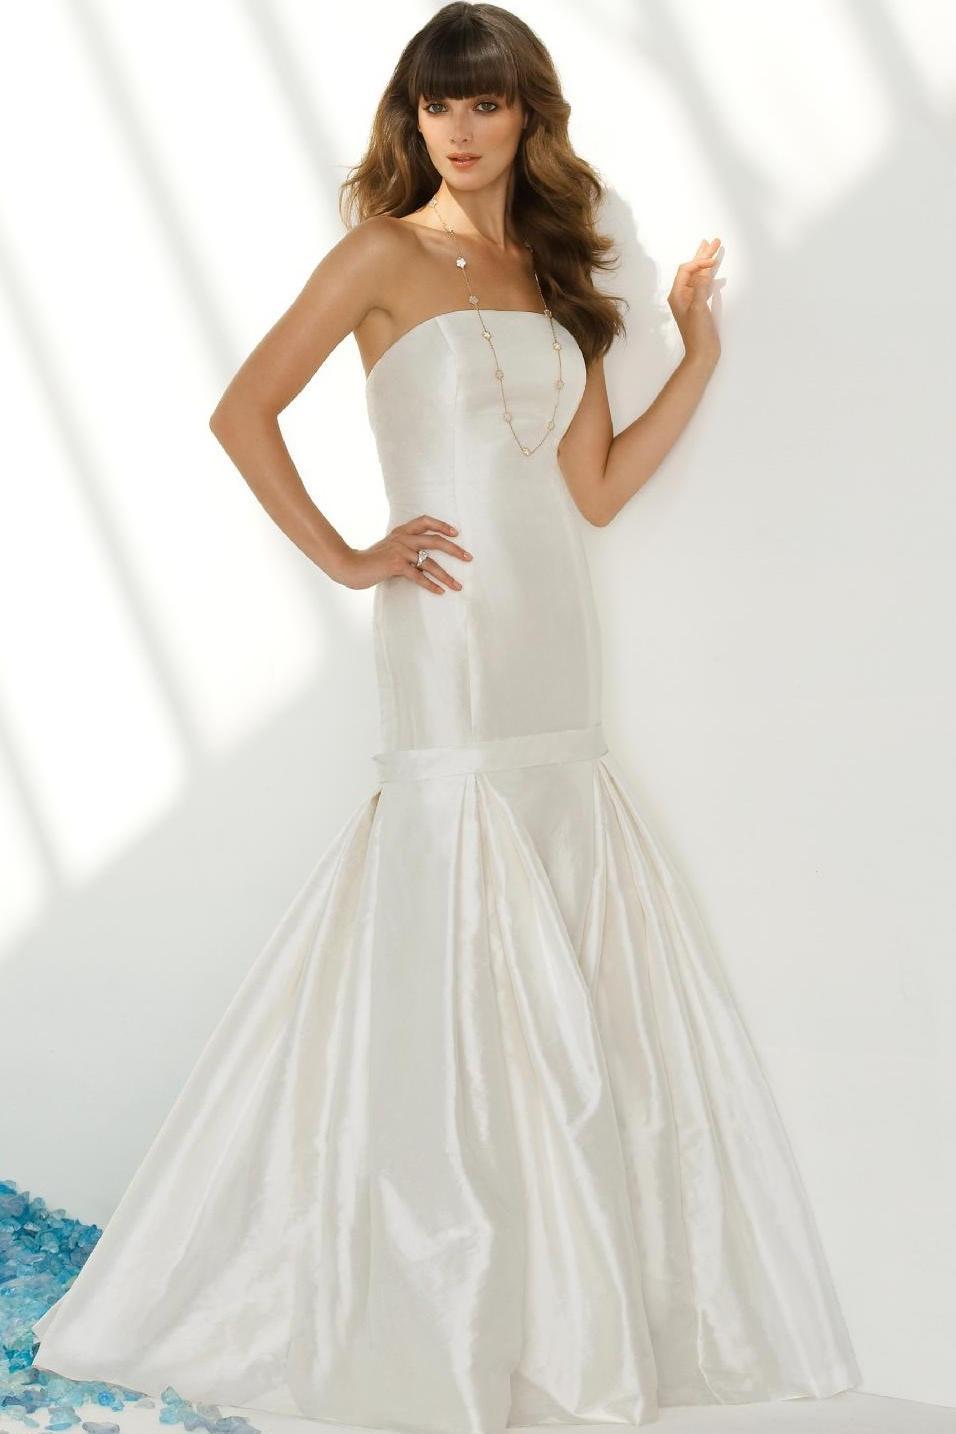 White Strapless Taffeta Mermaid Wedding Dress QA0180